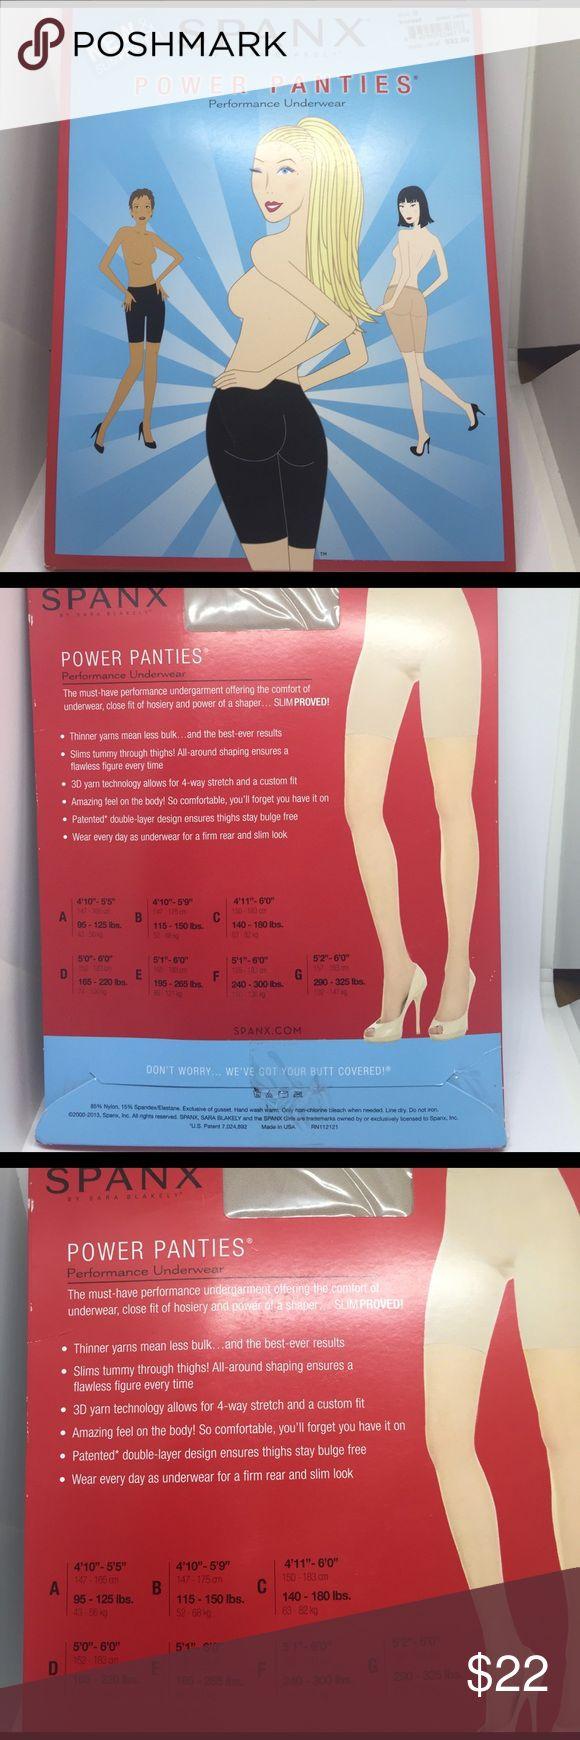 Spanx Power Panties Spanx Power Panties Performance underwear           color-Barest SPANX Intimates & Sleepwear Shapewear